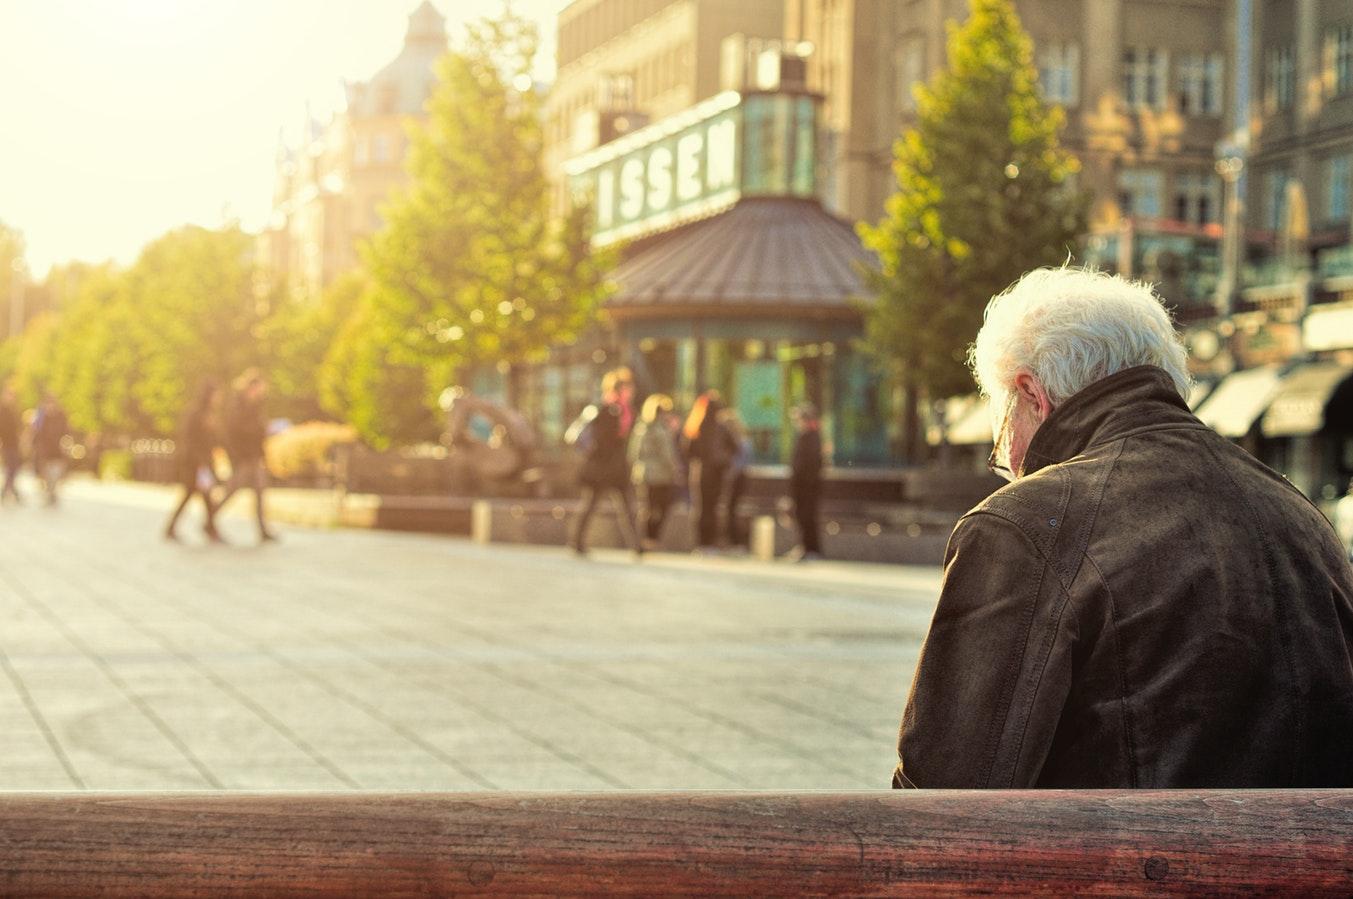 An older gentleman sitting alone on an outdoor bench.